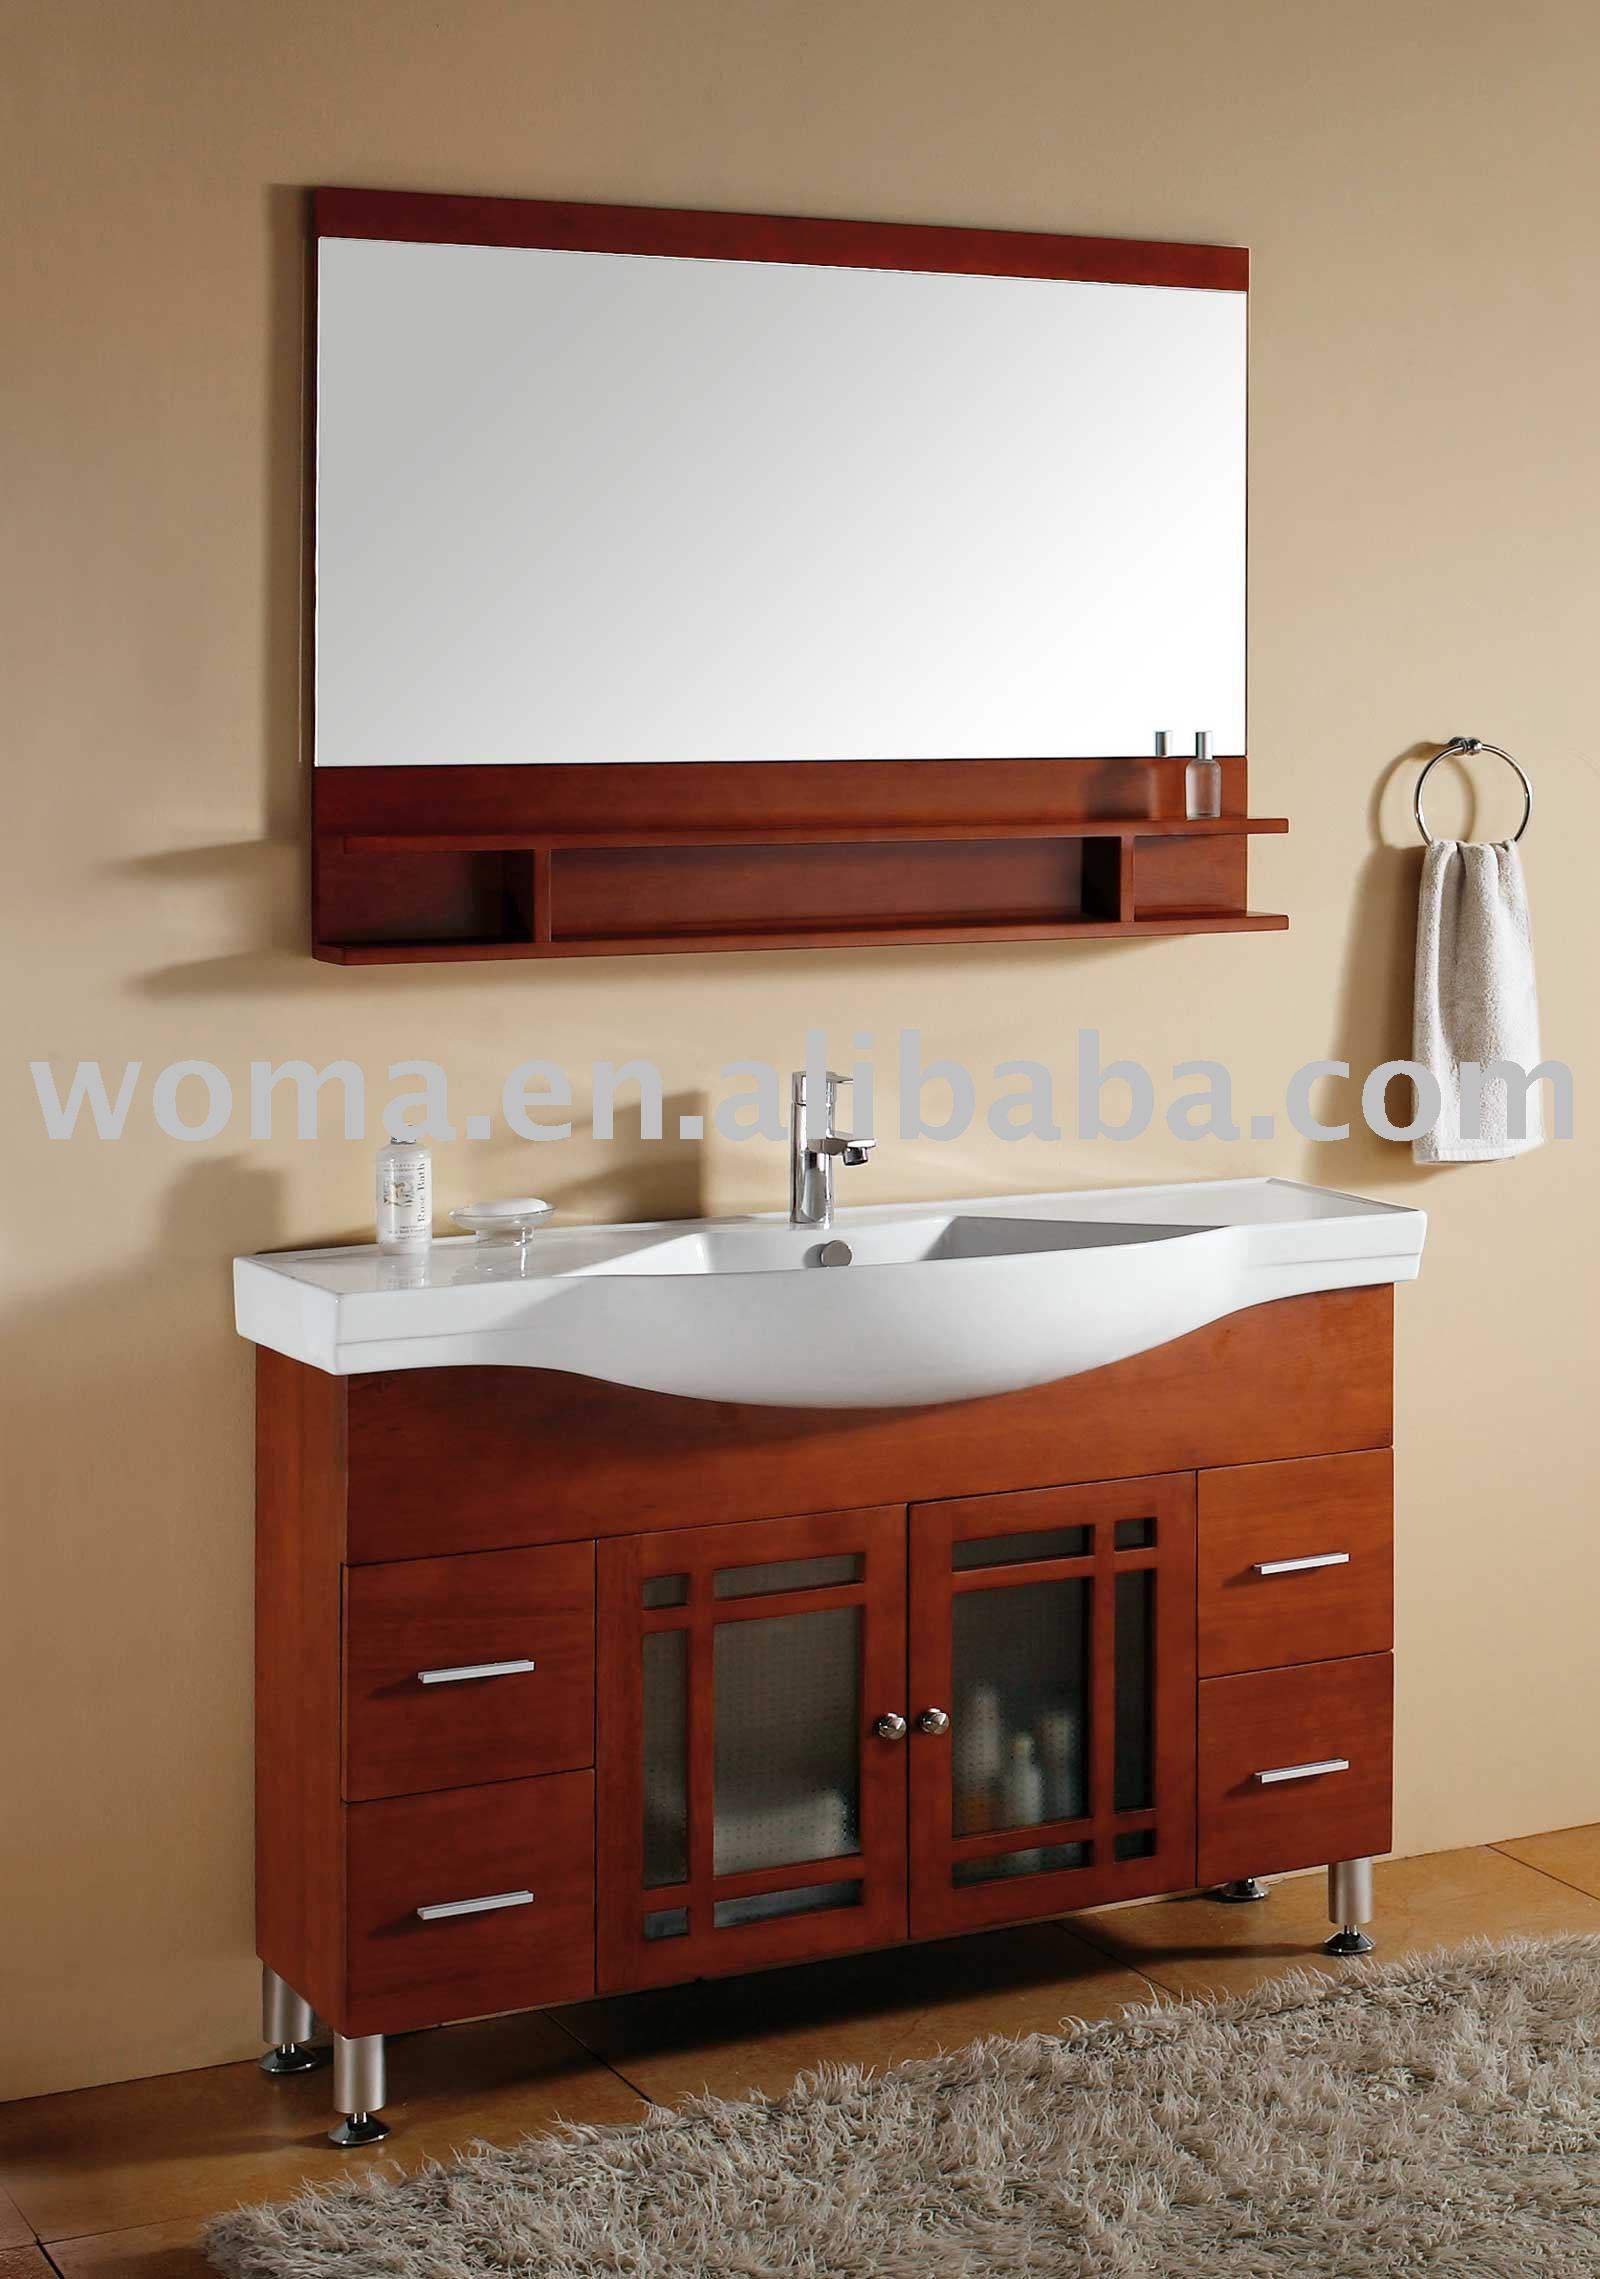 DIY BATHROOM SINK CABINET | EHOW.COM